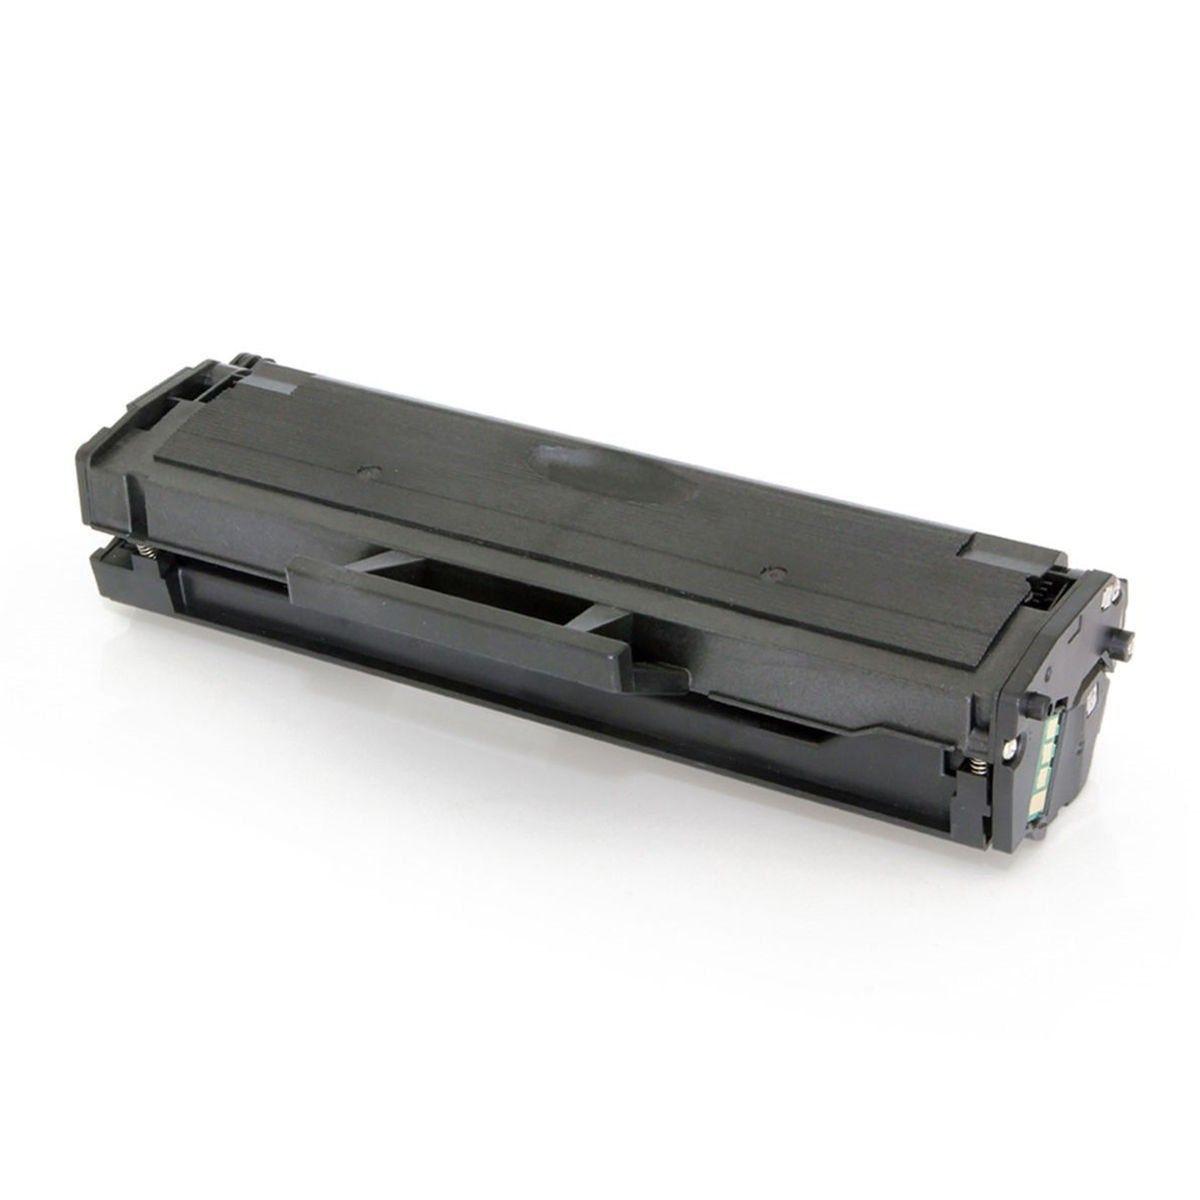 Compatível: Toner 106R02773 para Xerox Workcentre 3025 3025bi 3025ni Phaser 3020 3020bi WC3025 WC3025ni / Preto / 1.500